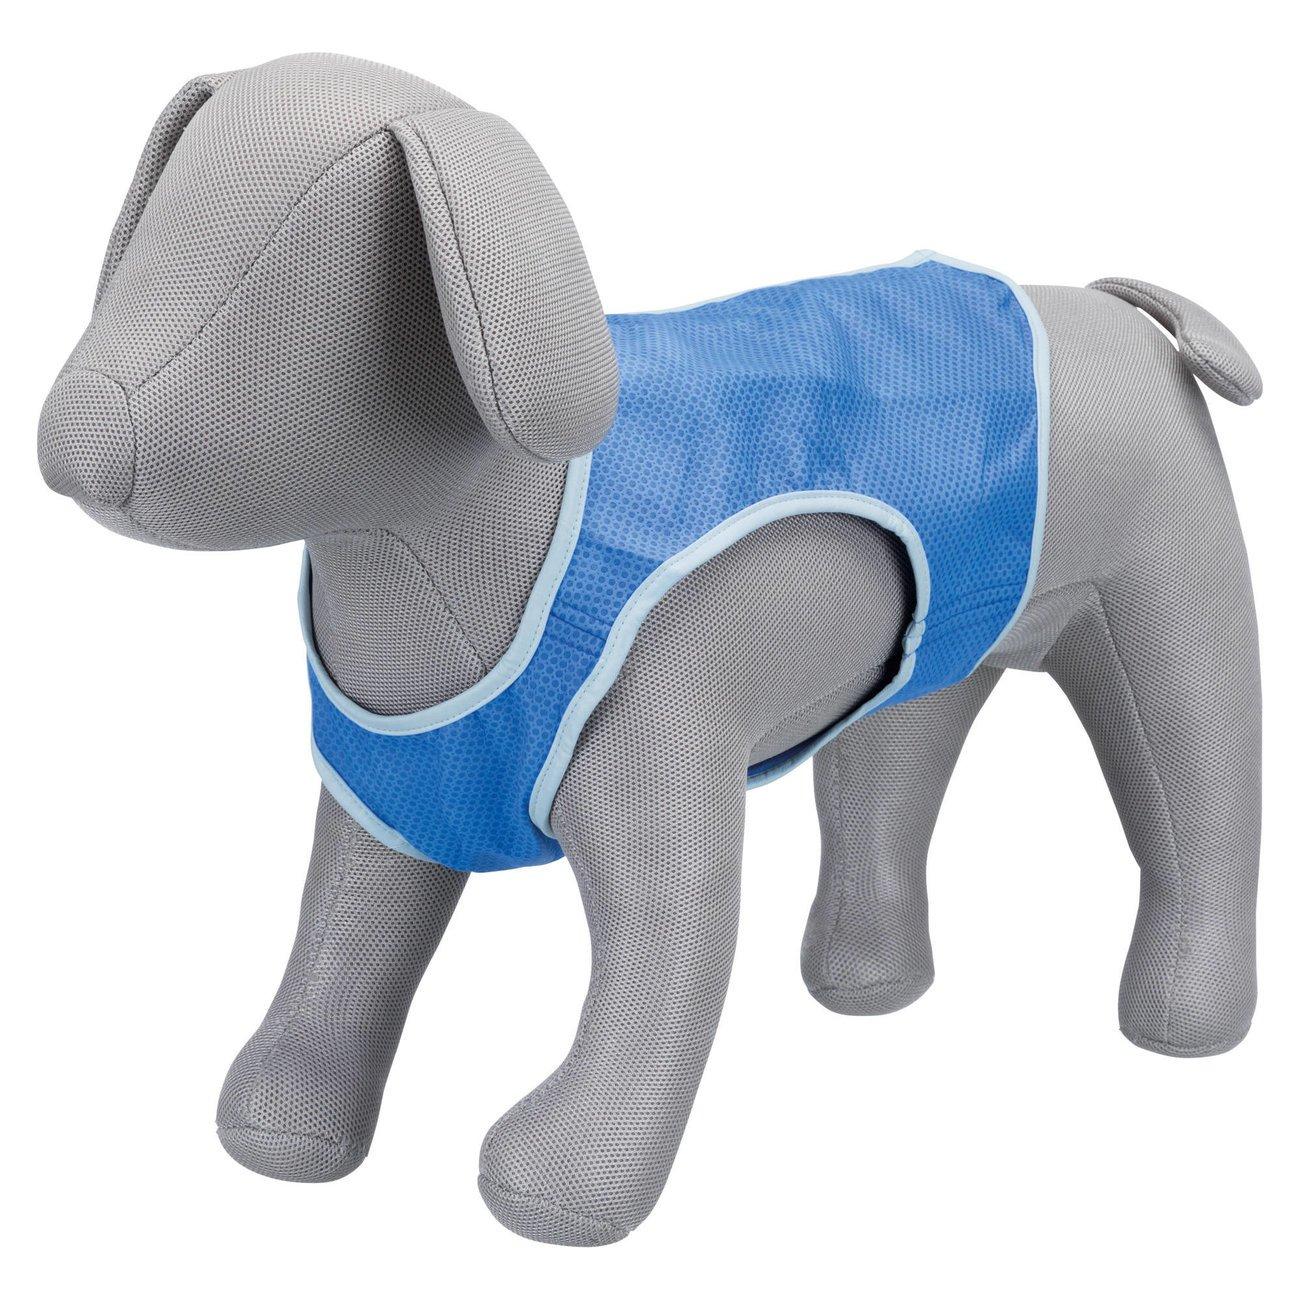 TRIXIE Kühlweste für Hunde 30131, Bild 3